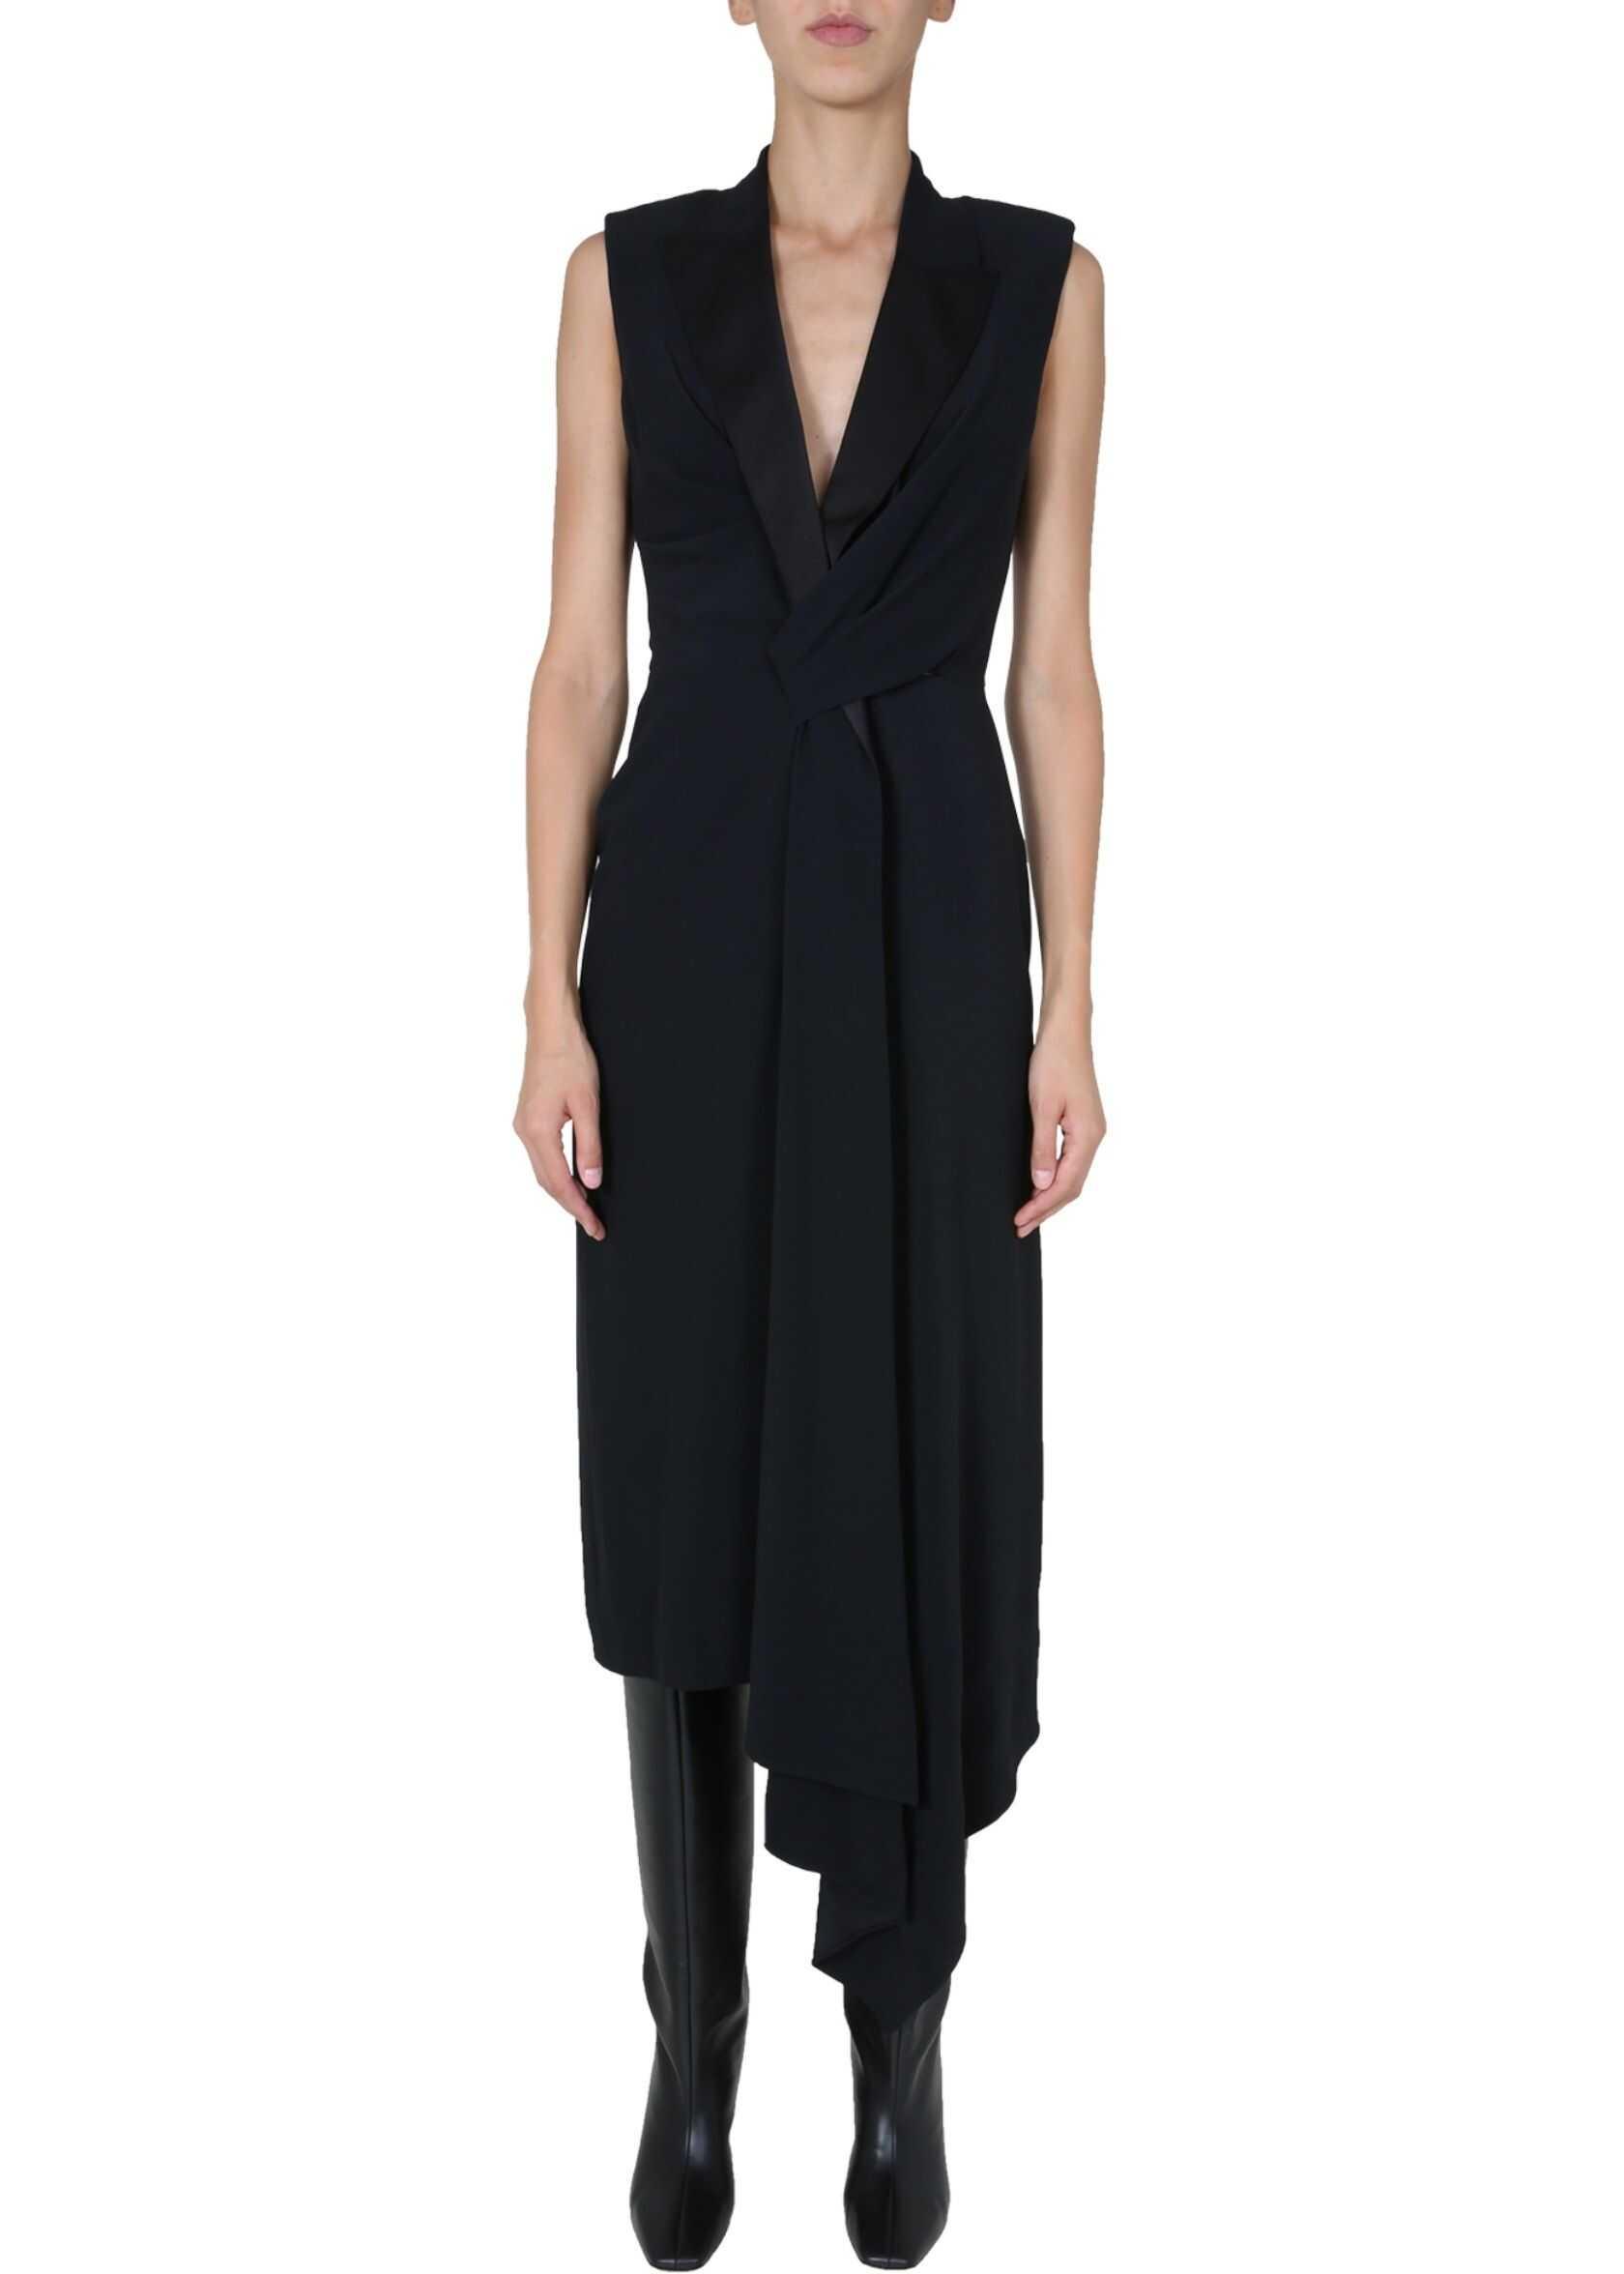 Alexander McQueen Midi Dress BLACK